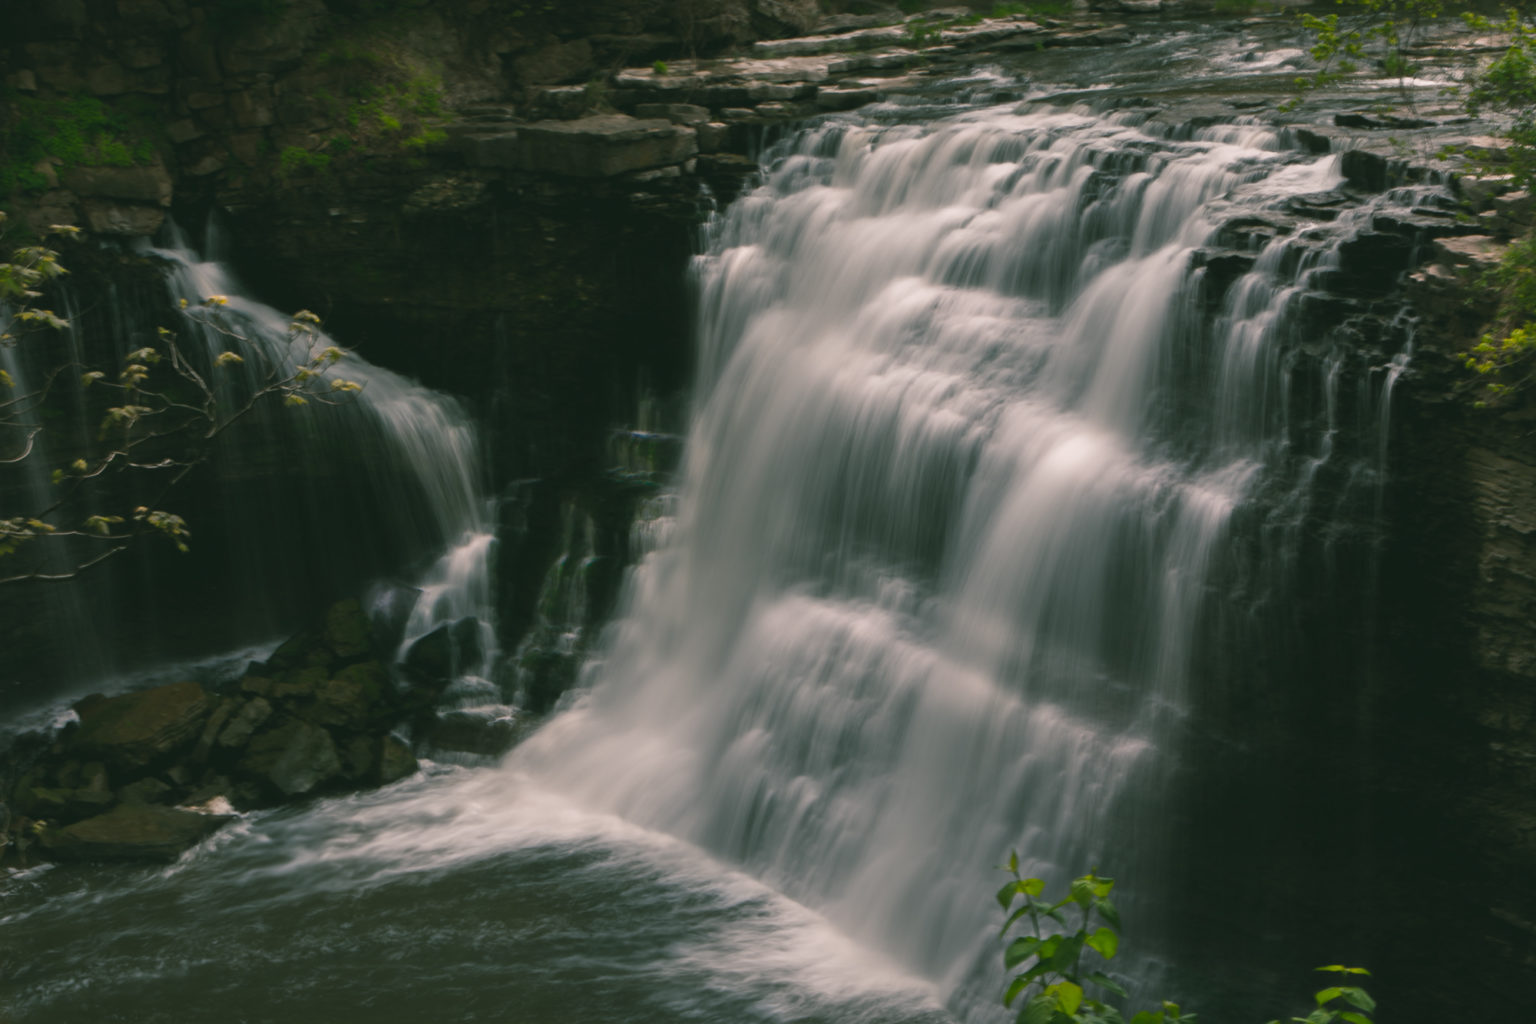 Hidden treasures in Ontario- Ball's falls!